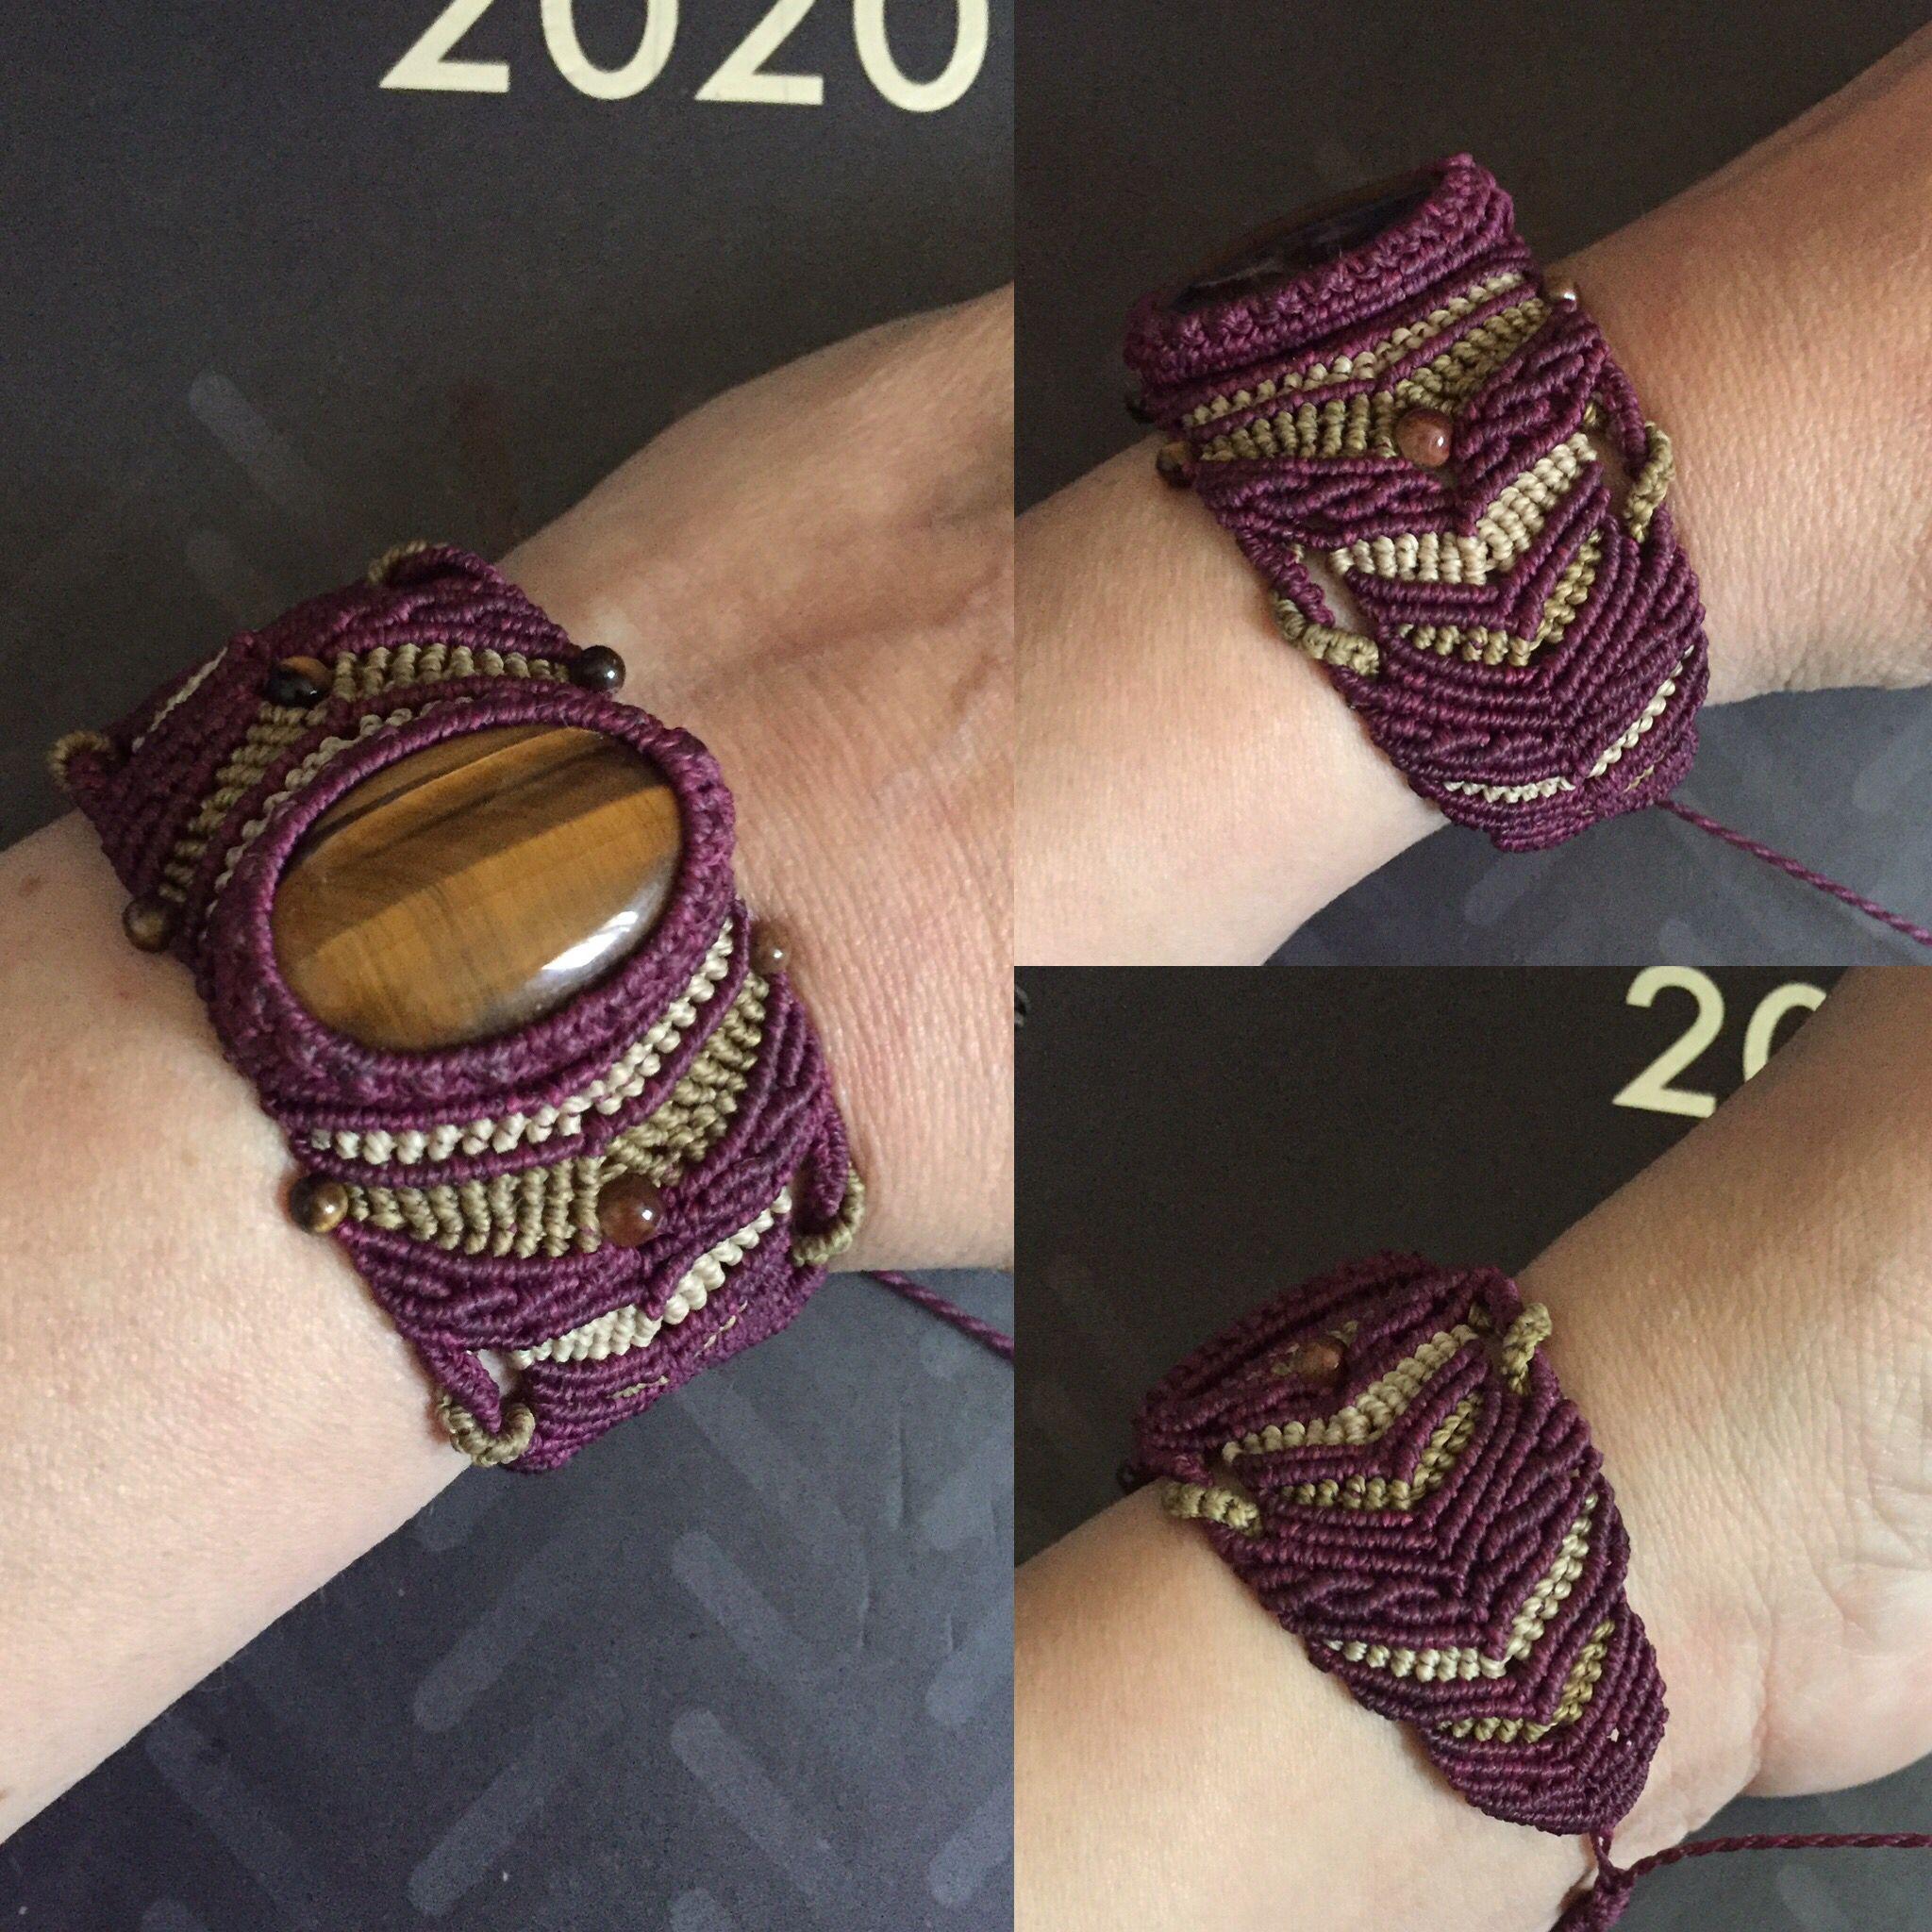 Bracelet avec cabochon et perles assorties en oeil de tigre #magicarocreation #macrame #micromacrame #macramejewelry